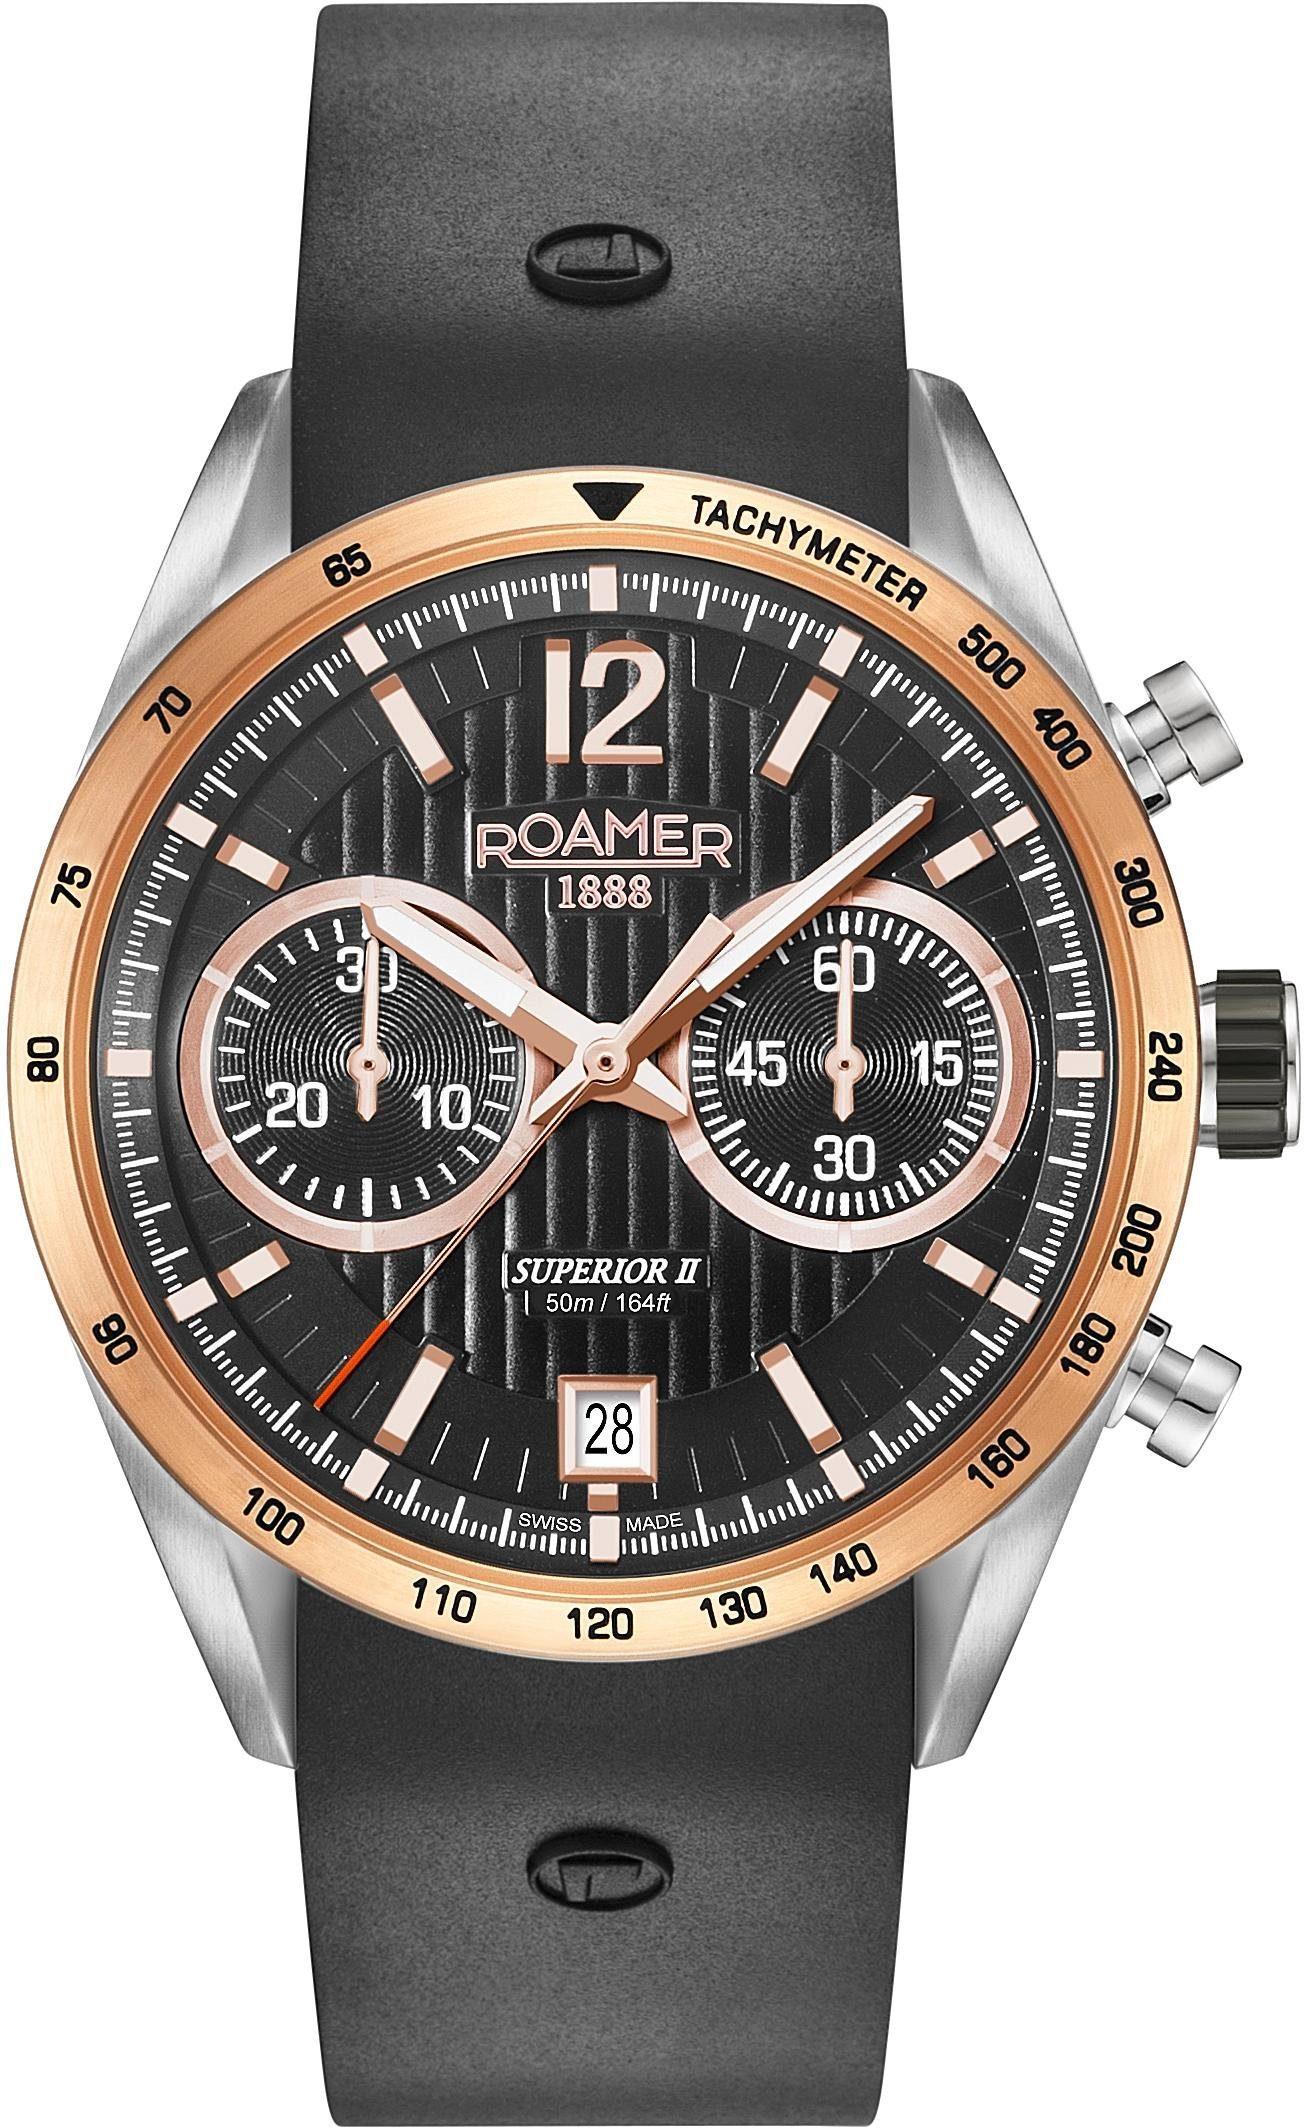 Roamer Chronograph »SUPERIOR CHRONO II, 510902 39 54 05« mit kleiner Sekunde